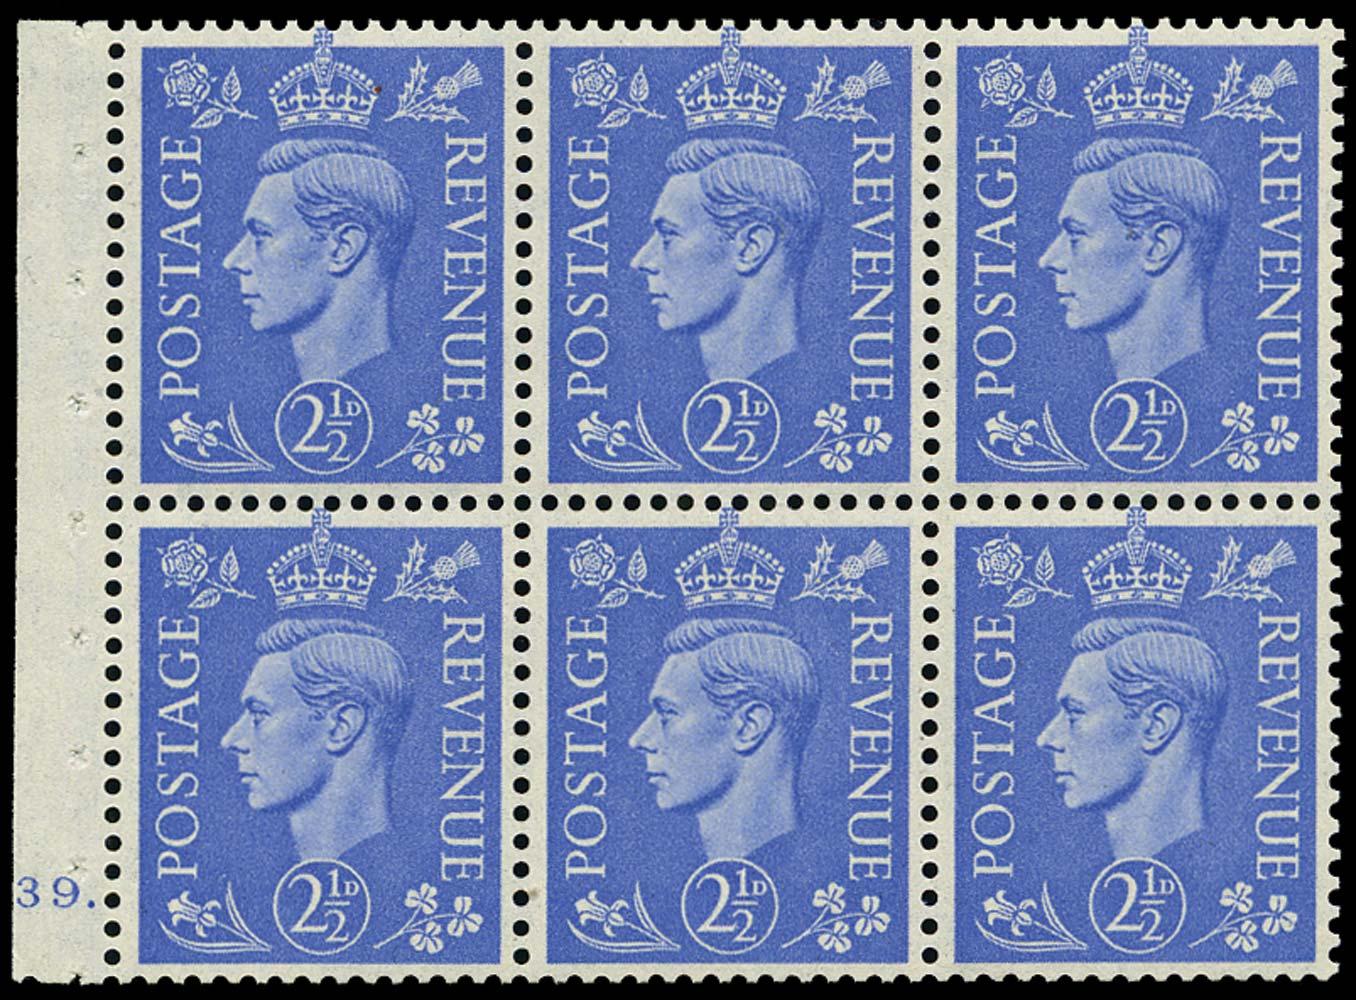 GB 1942  SG489l Booklet pane of six, U/M